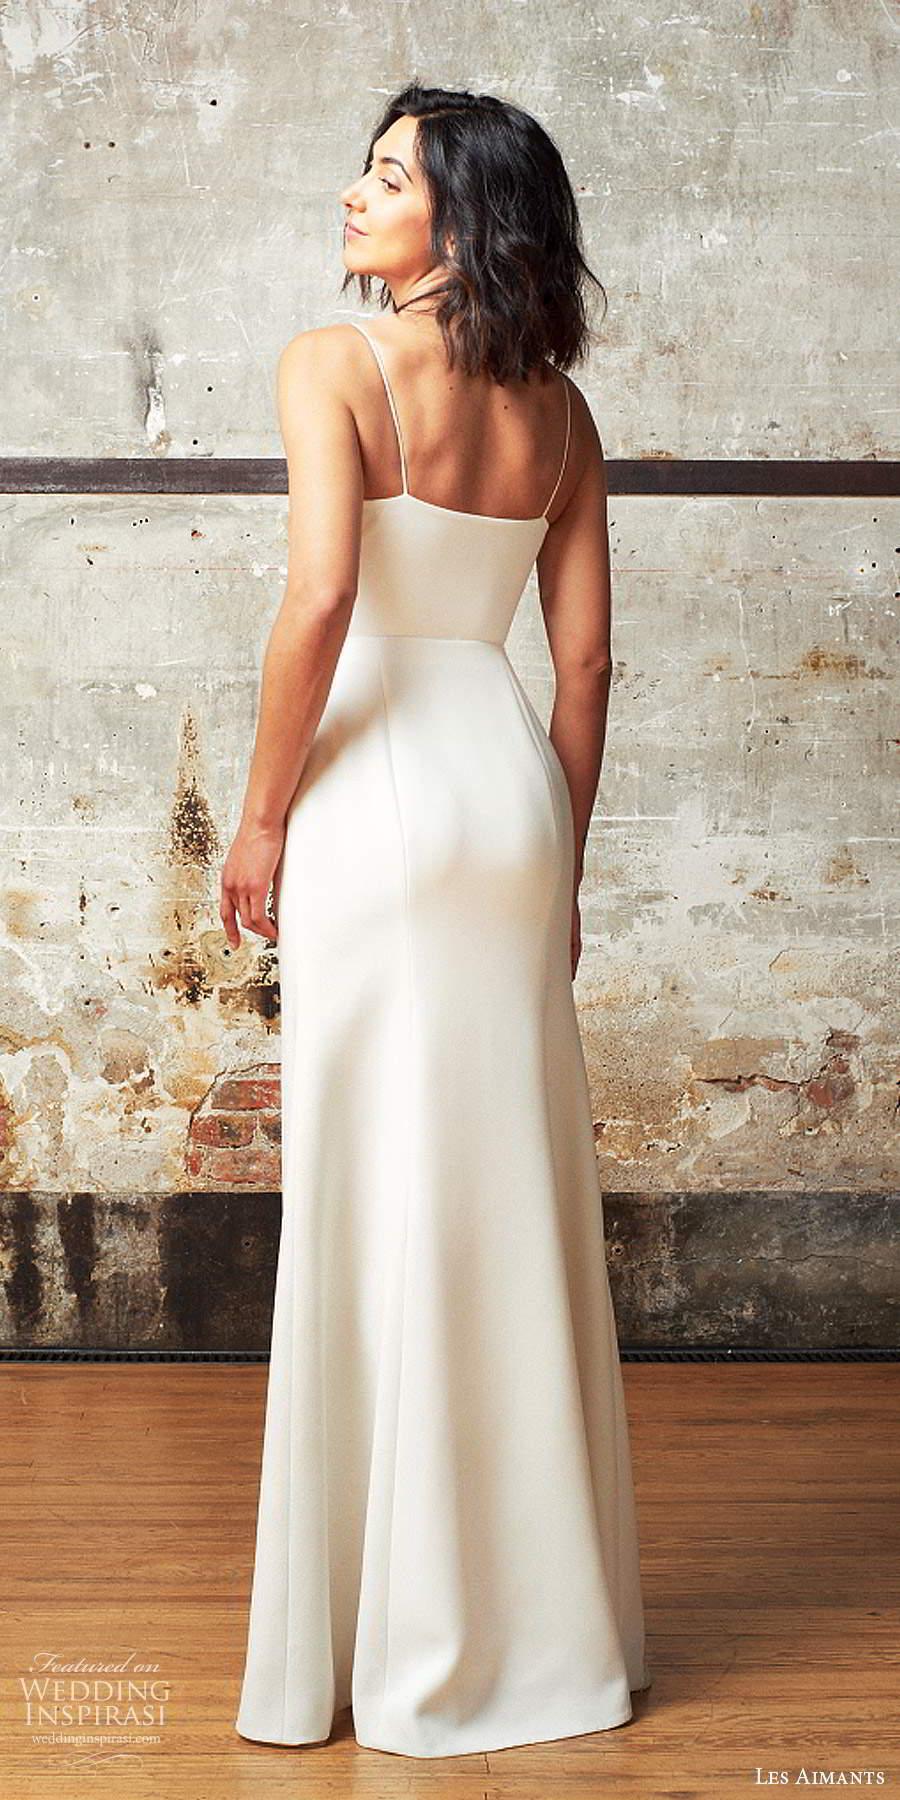 les aimants 2019 bridal sleeveless thin straps semi sweetheart neckline clean minimally enbellished column wedding dress slit skirt chapel train (8) bv